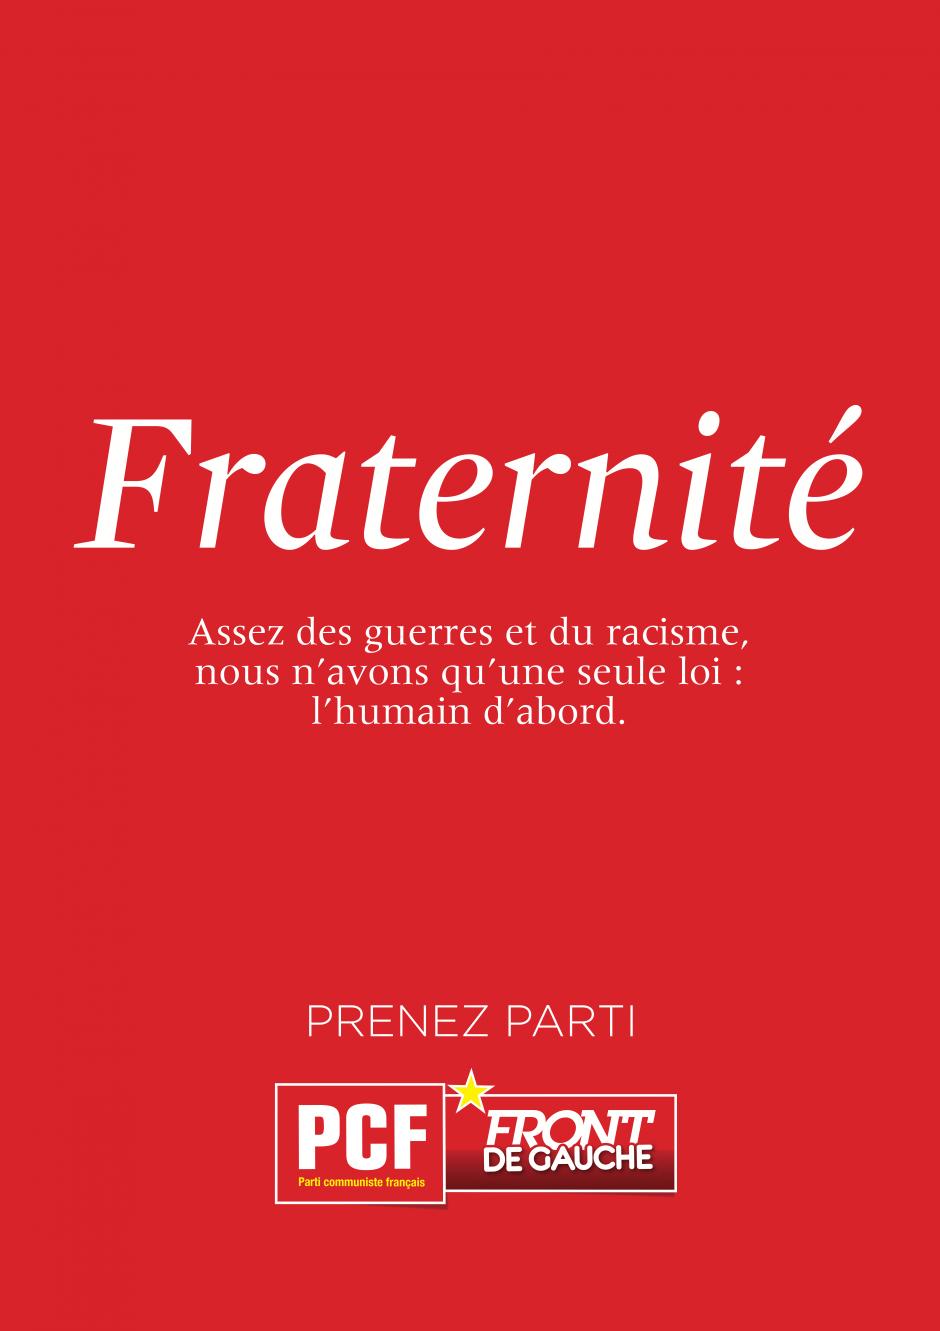 AFFICHE FRATERNITE